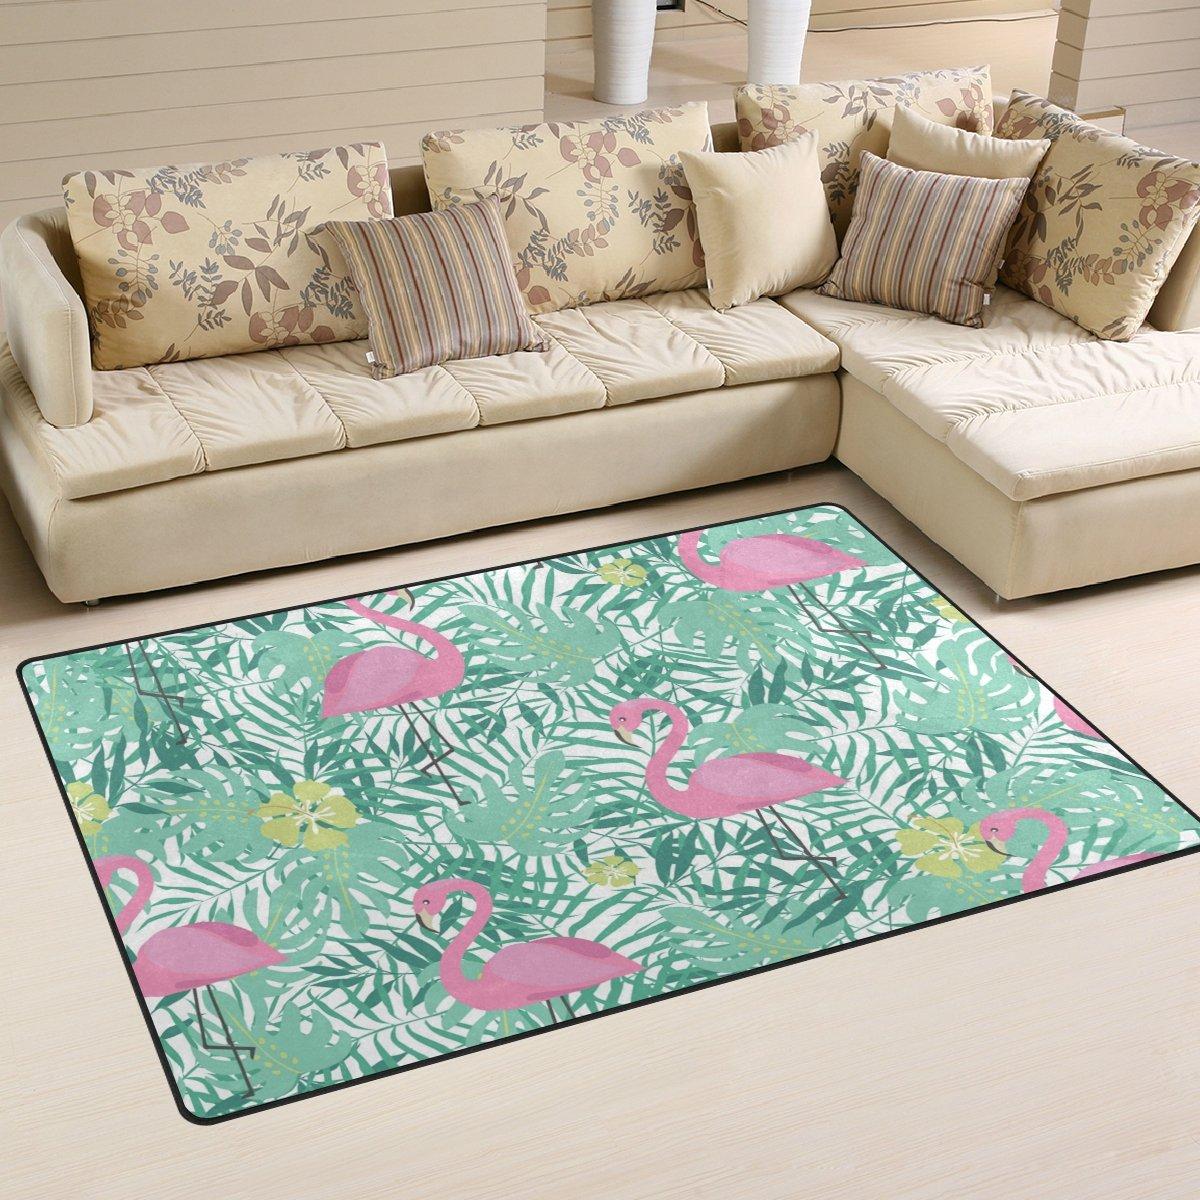 Area Rugs Kitchen Floor Mat Bedroom Carpet Watercolor Pink Flamingo Palm Leaf